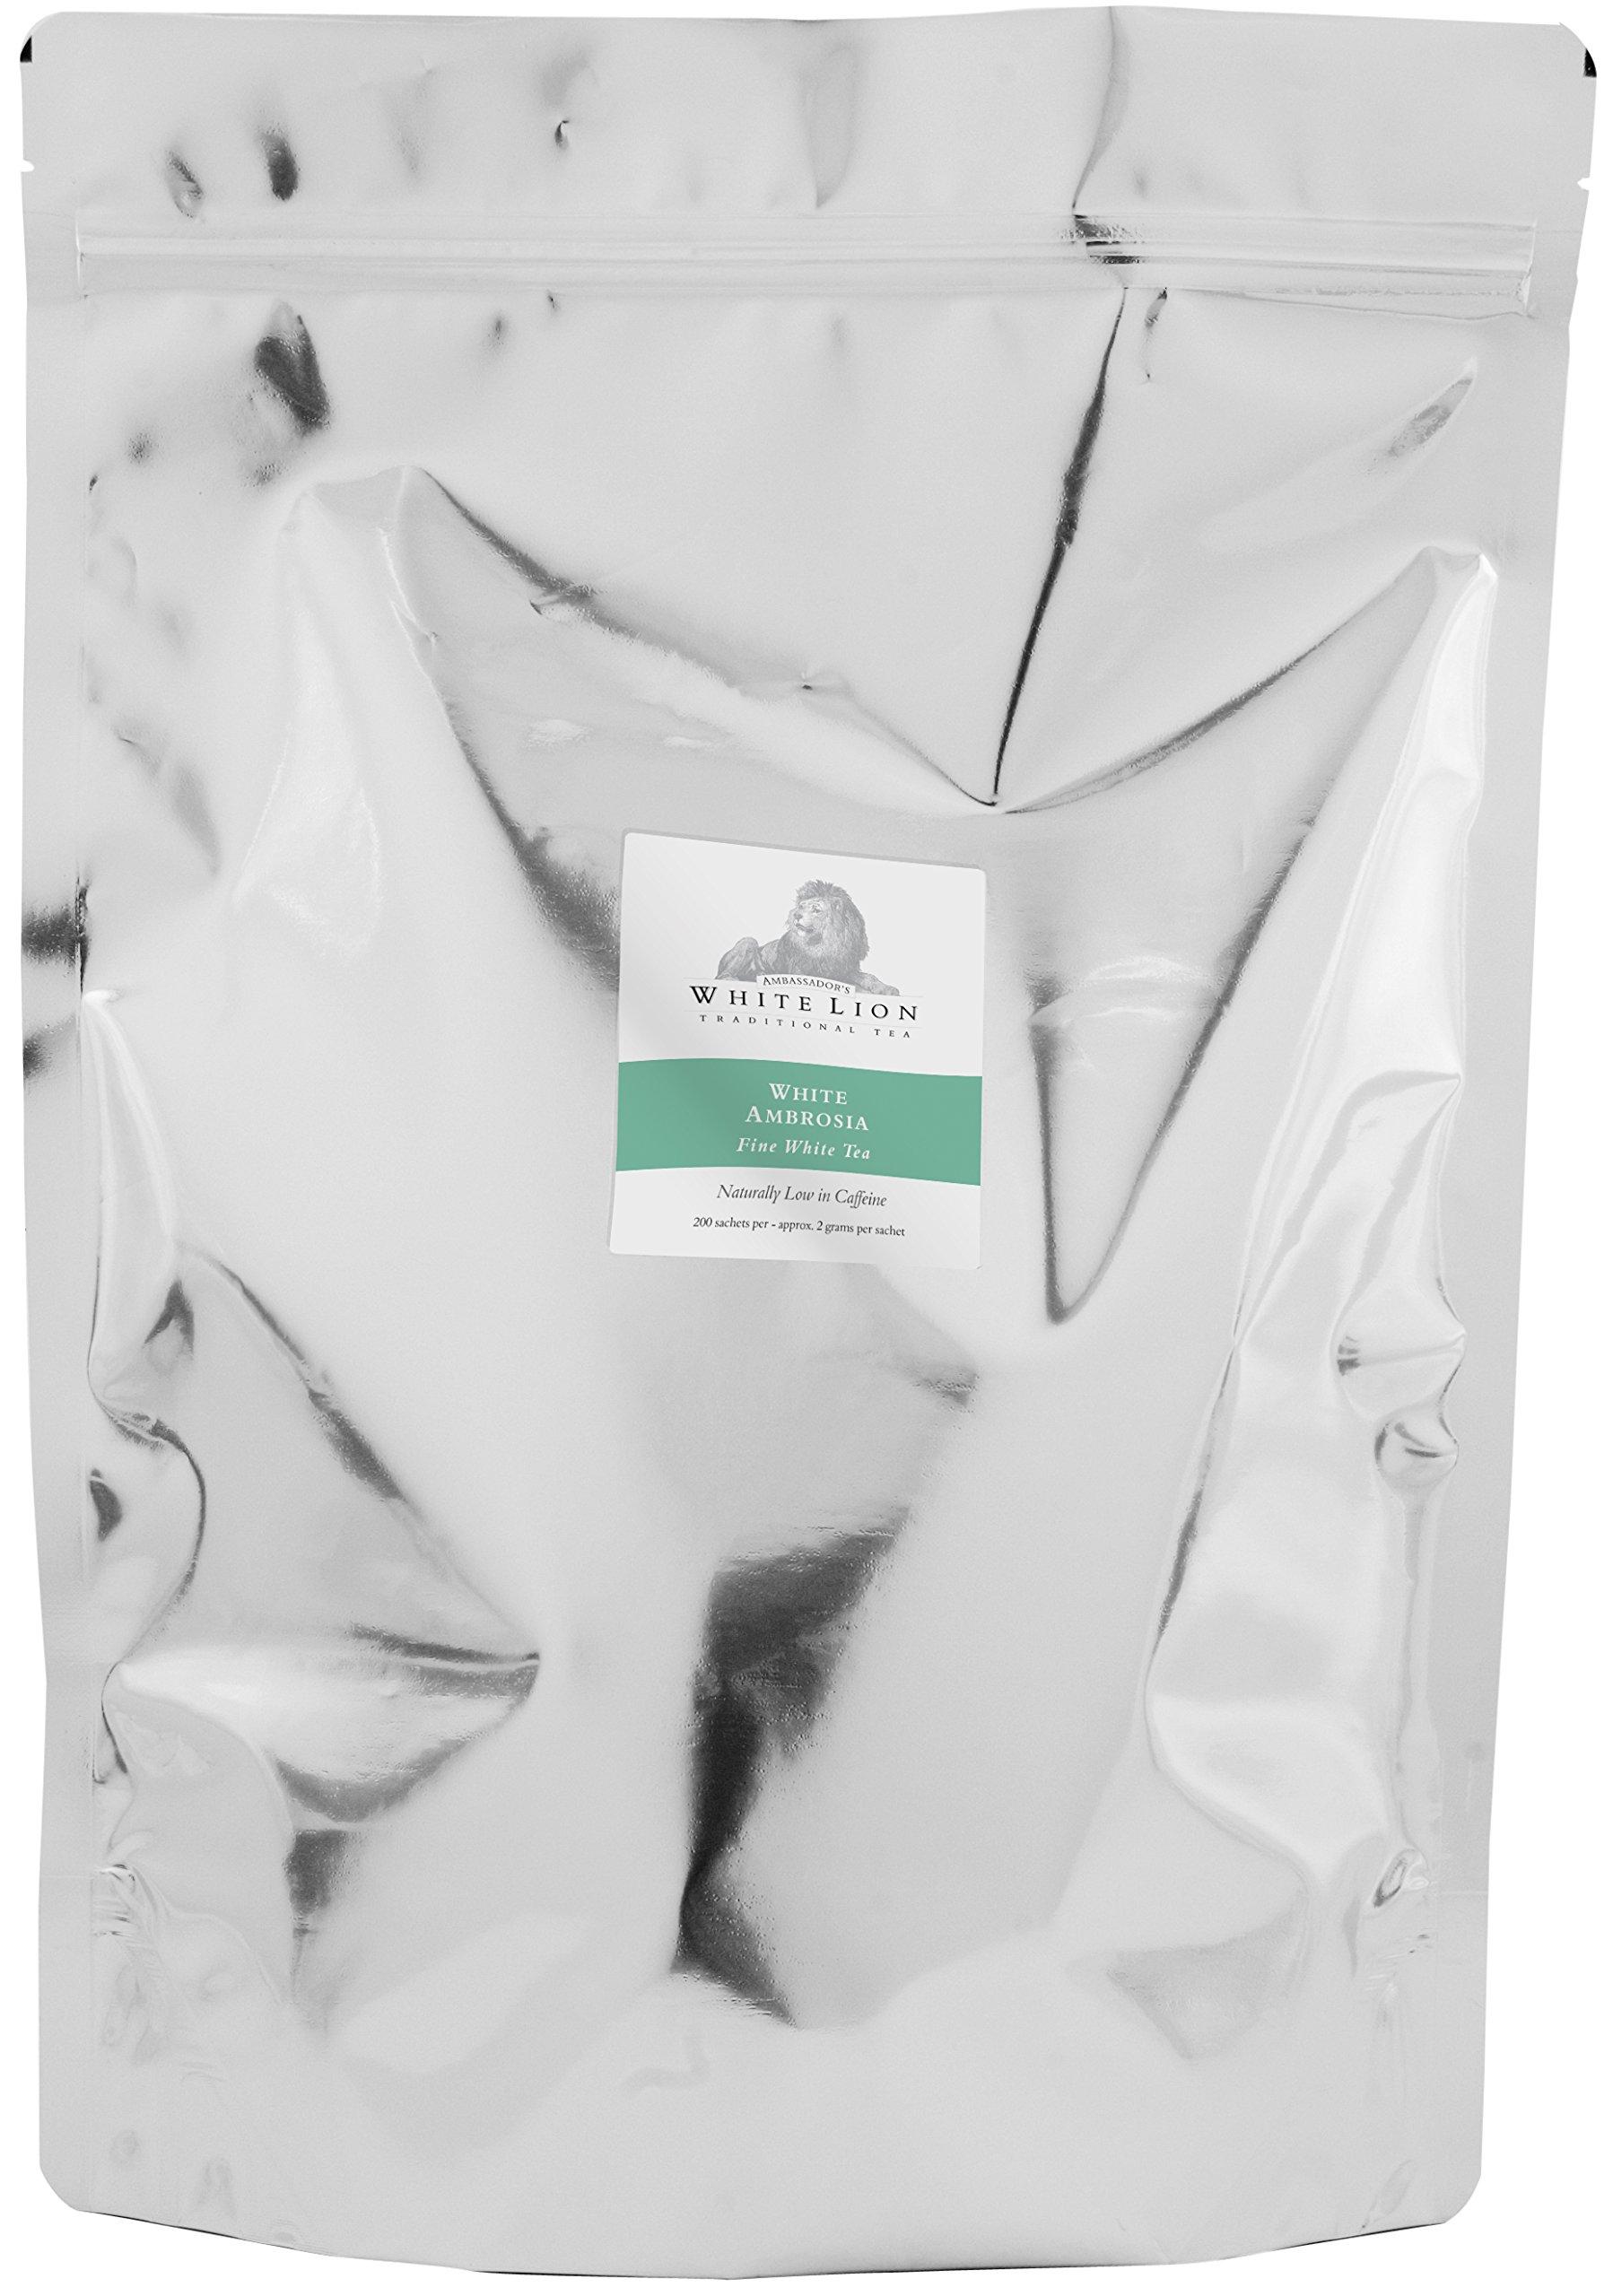 White Lion Limited - White Ambrosia Fine White Tea Bulk Sachets 2-200 Count Case by White Lion Limited (Image #1)